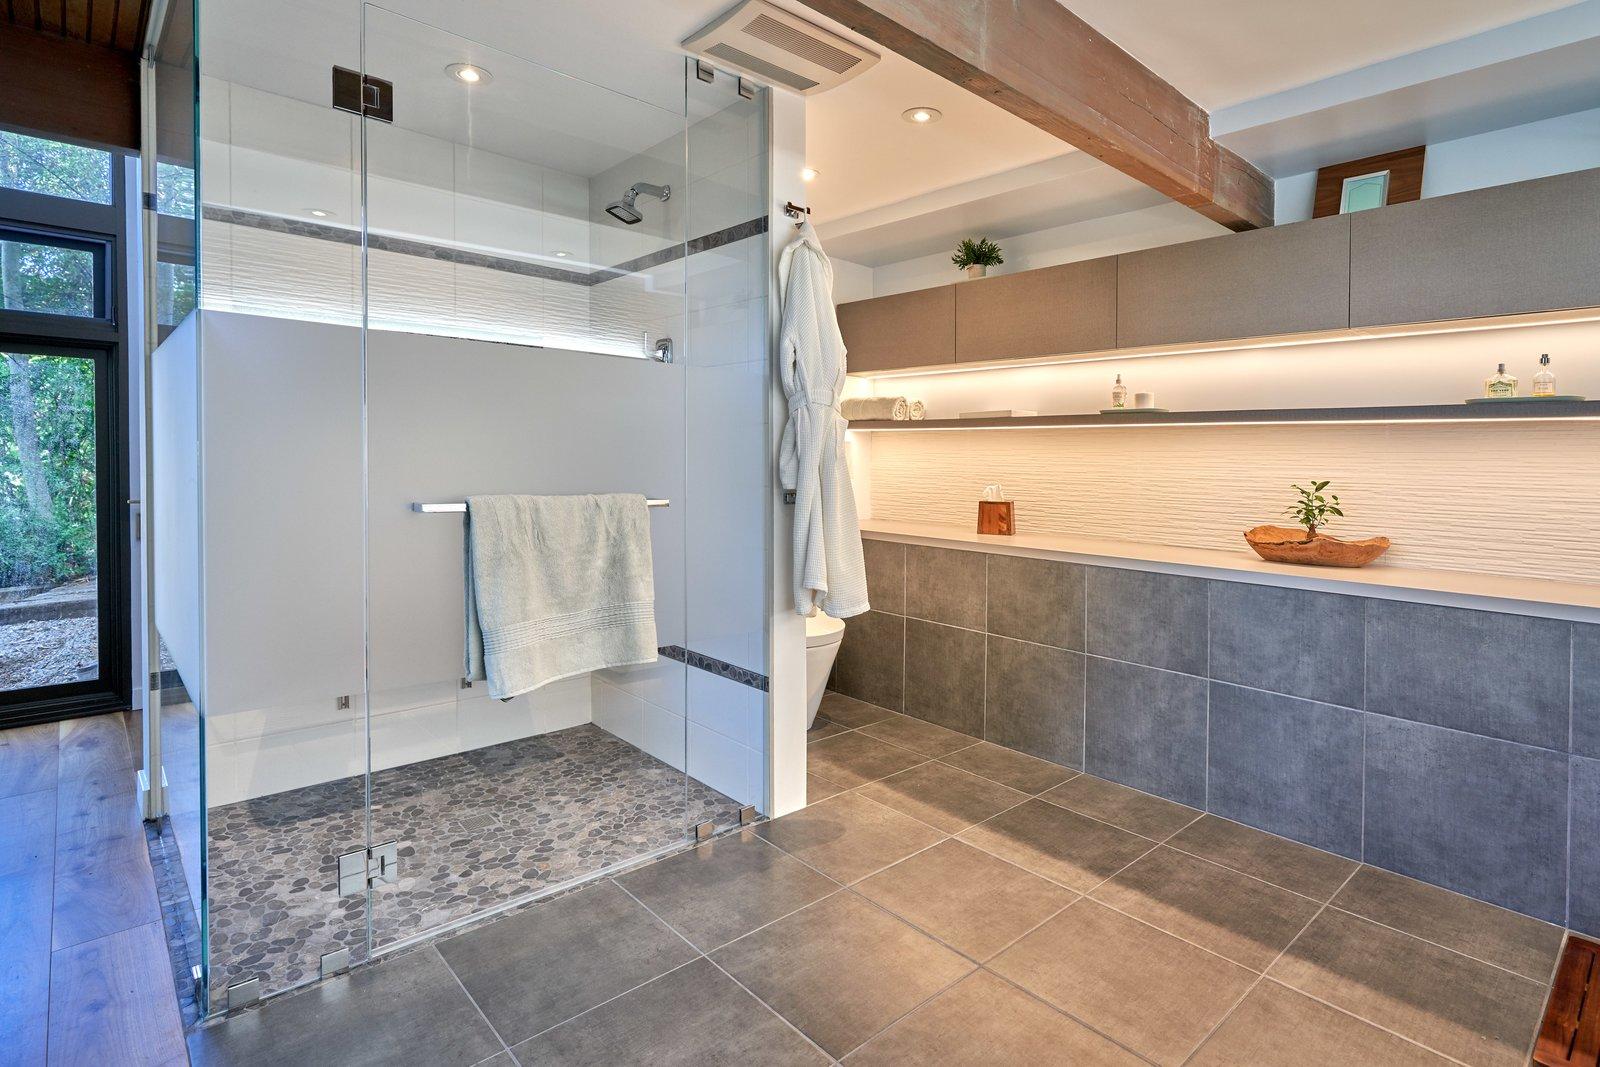 Millard Kaufman Residence bathroom